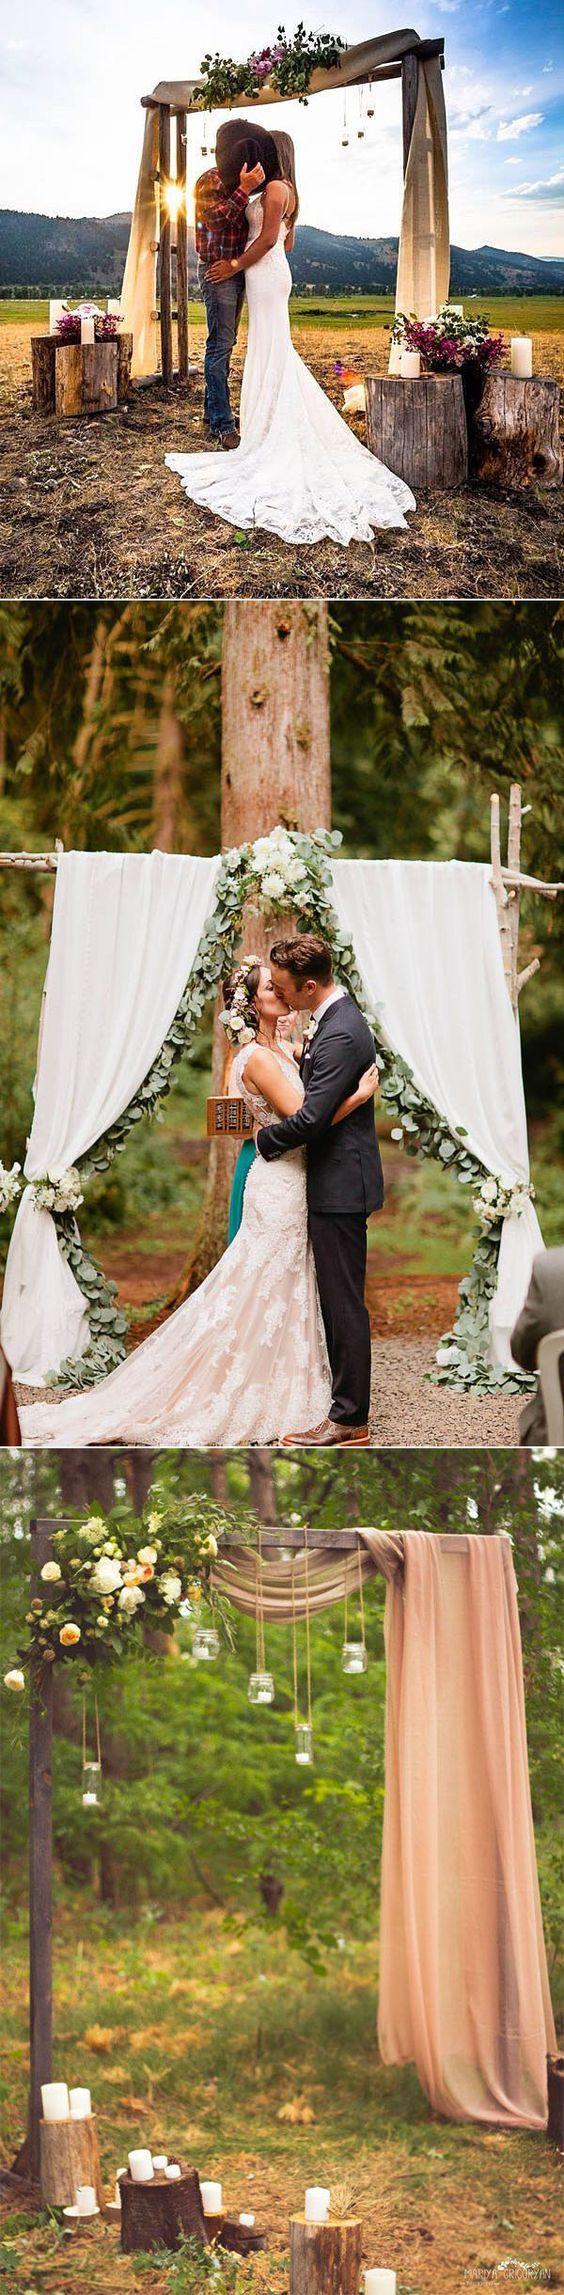 romantic easy DIY rustic wedding arches ideas